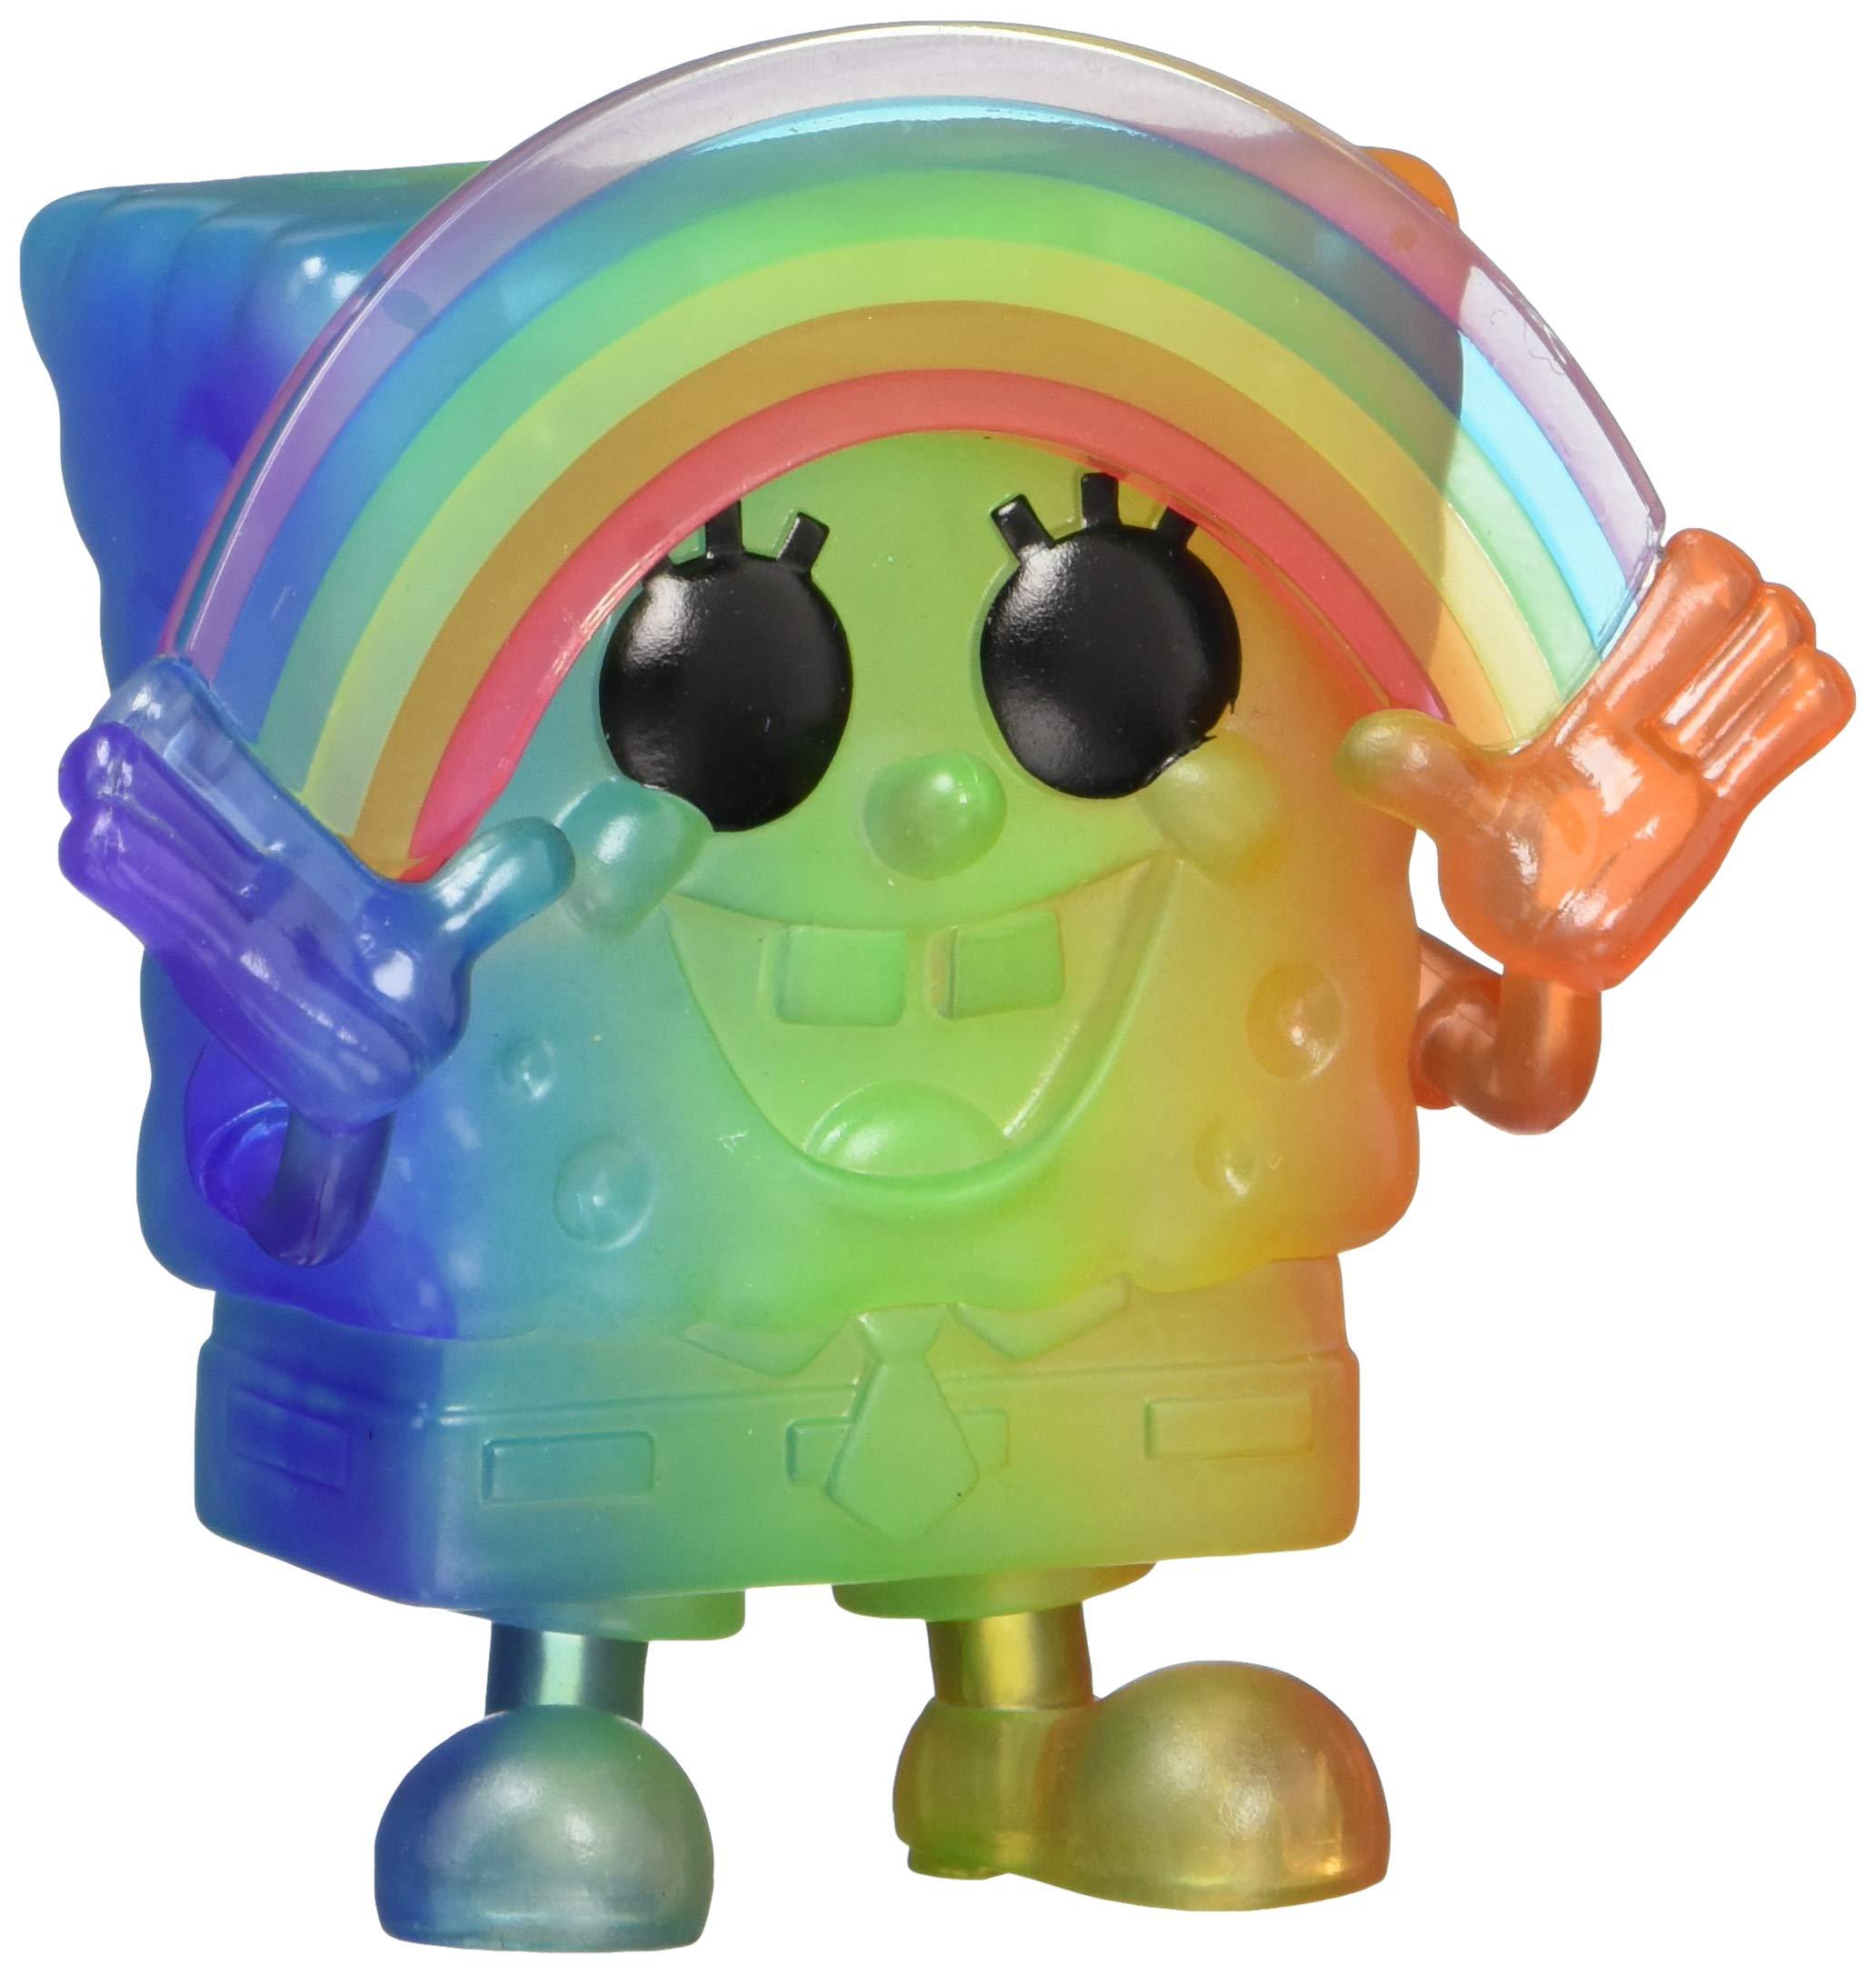 Funko Pop! Animation: Pride 2020 - Spongebob (Rainbow), 3.75 inches